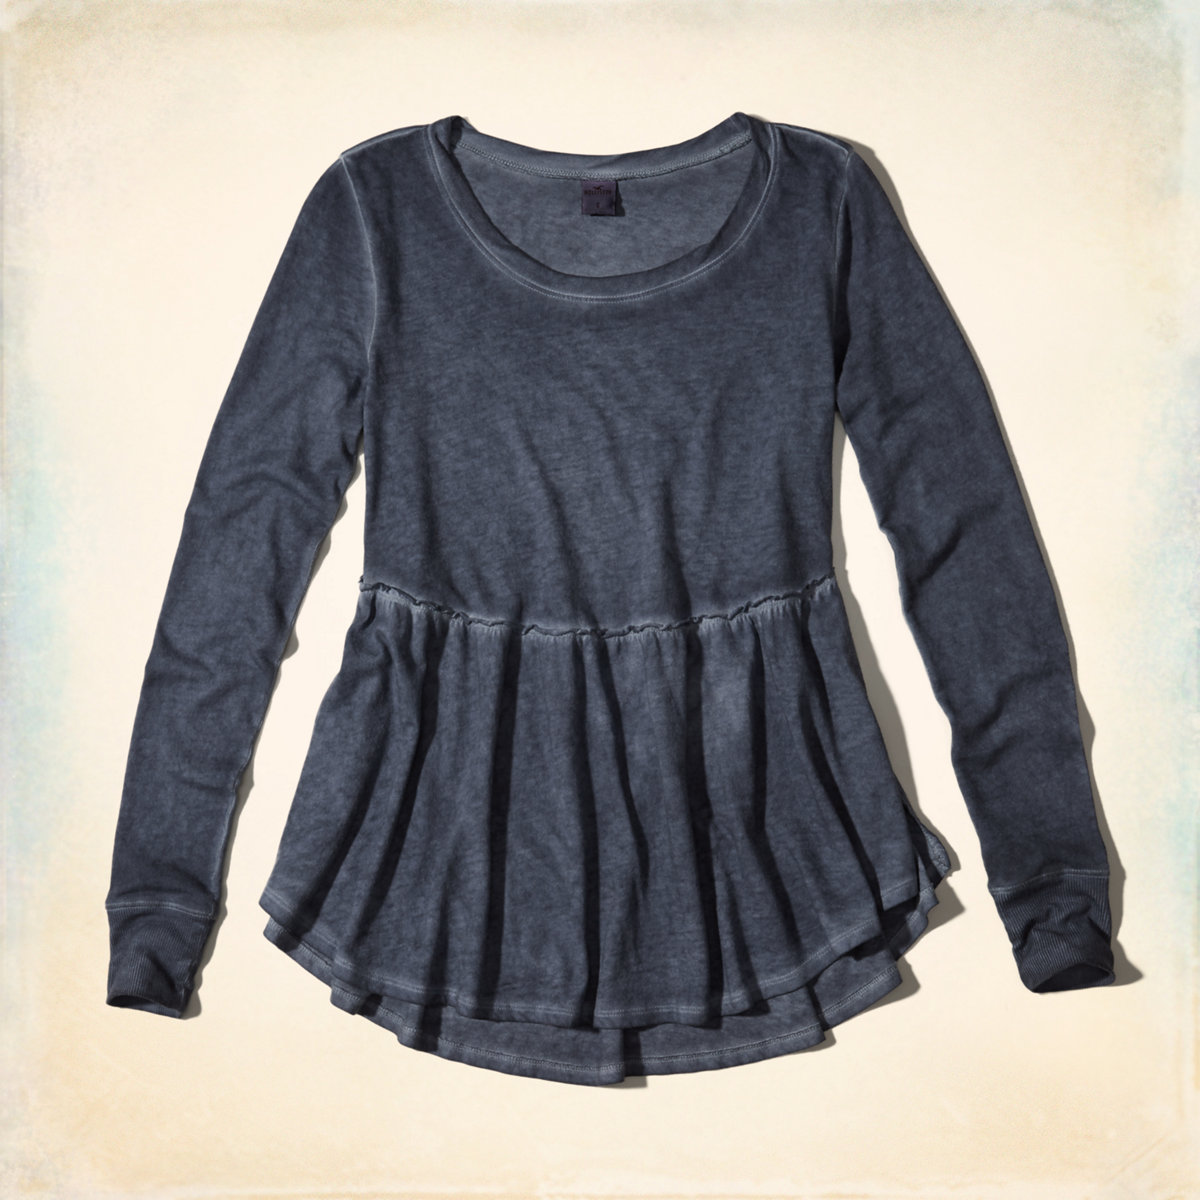 Garment-Dyed Peplum Top